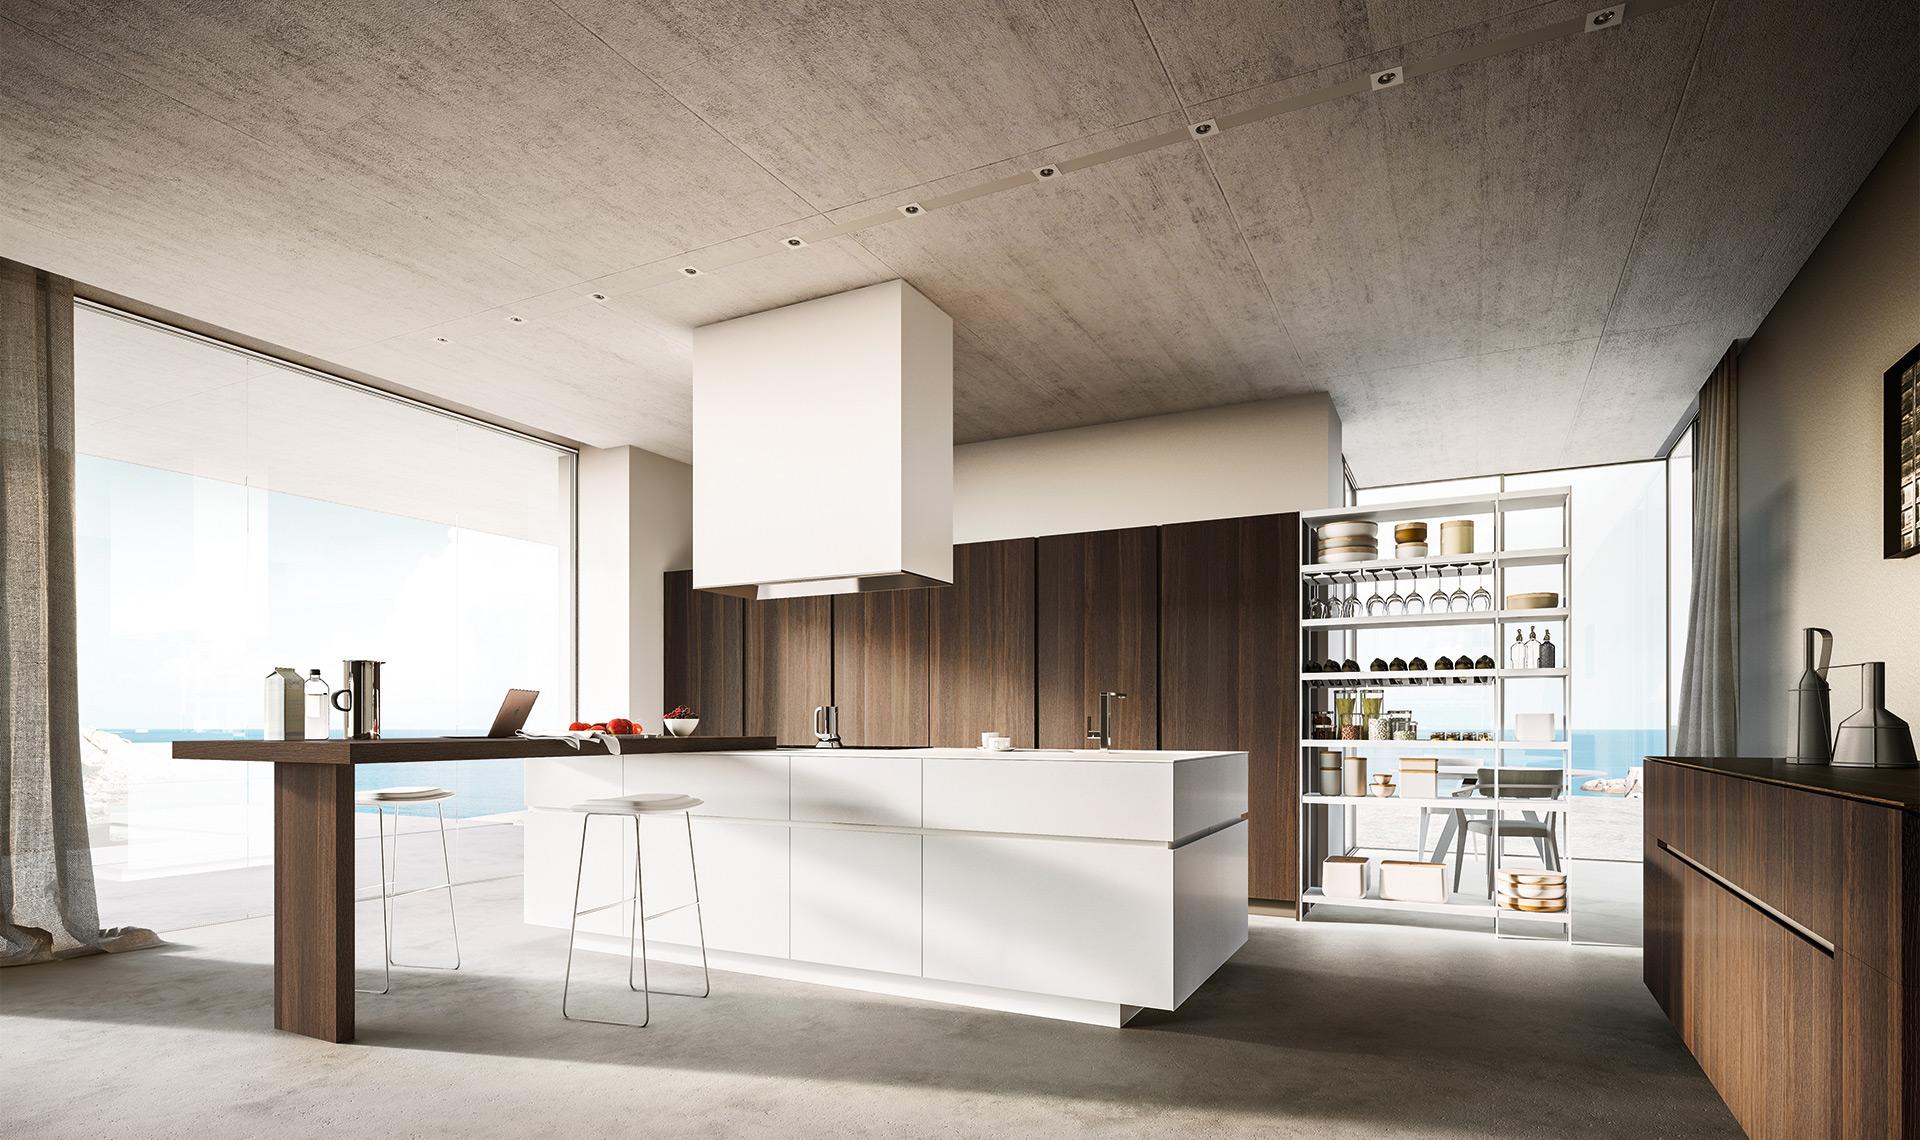 Valdesign realizza cucine moderne. Cucine moderne di alta qualità per la tua casa.